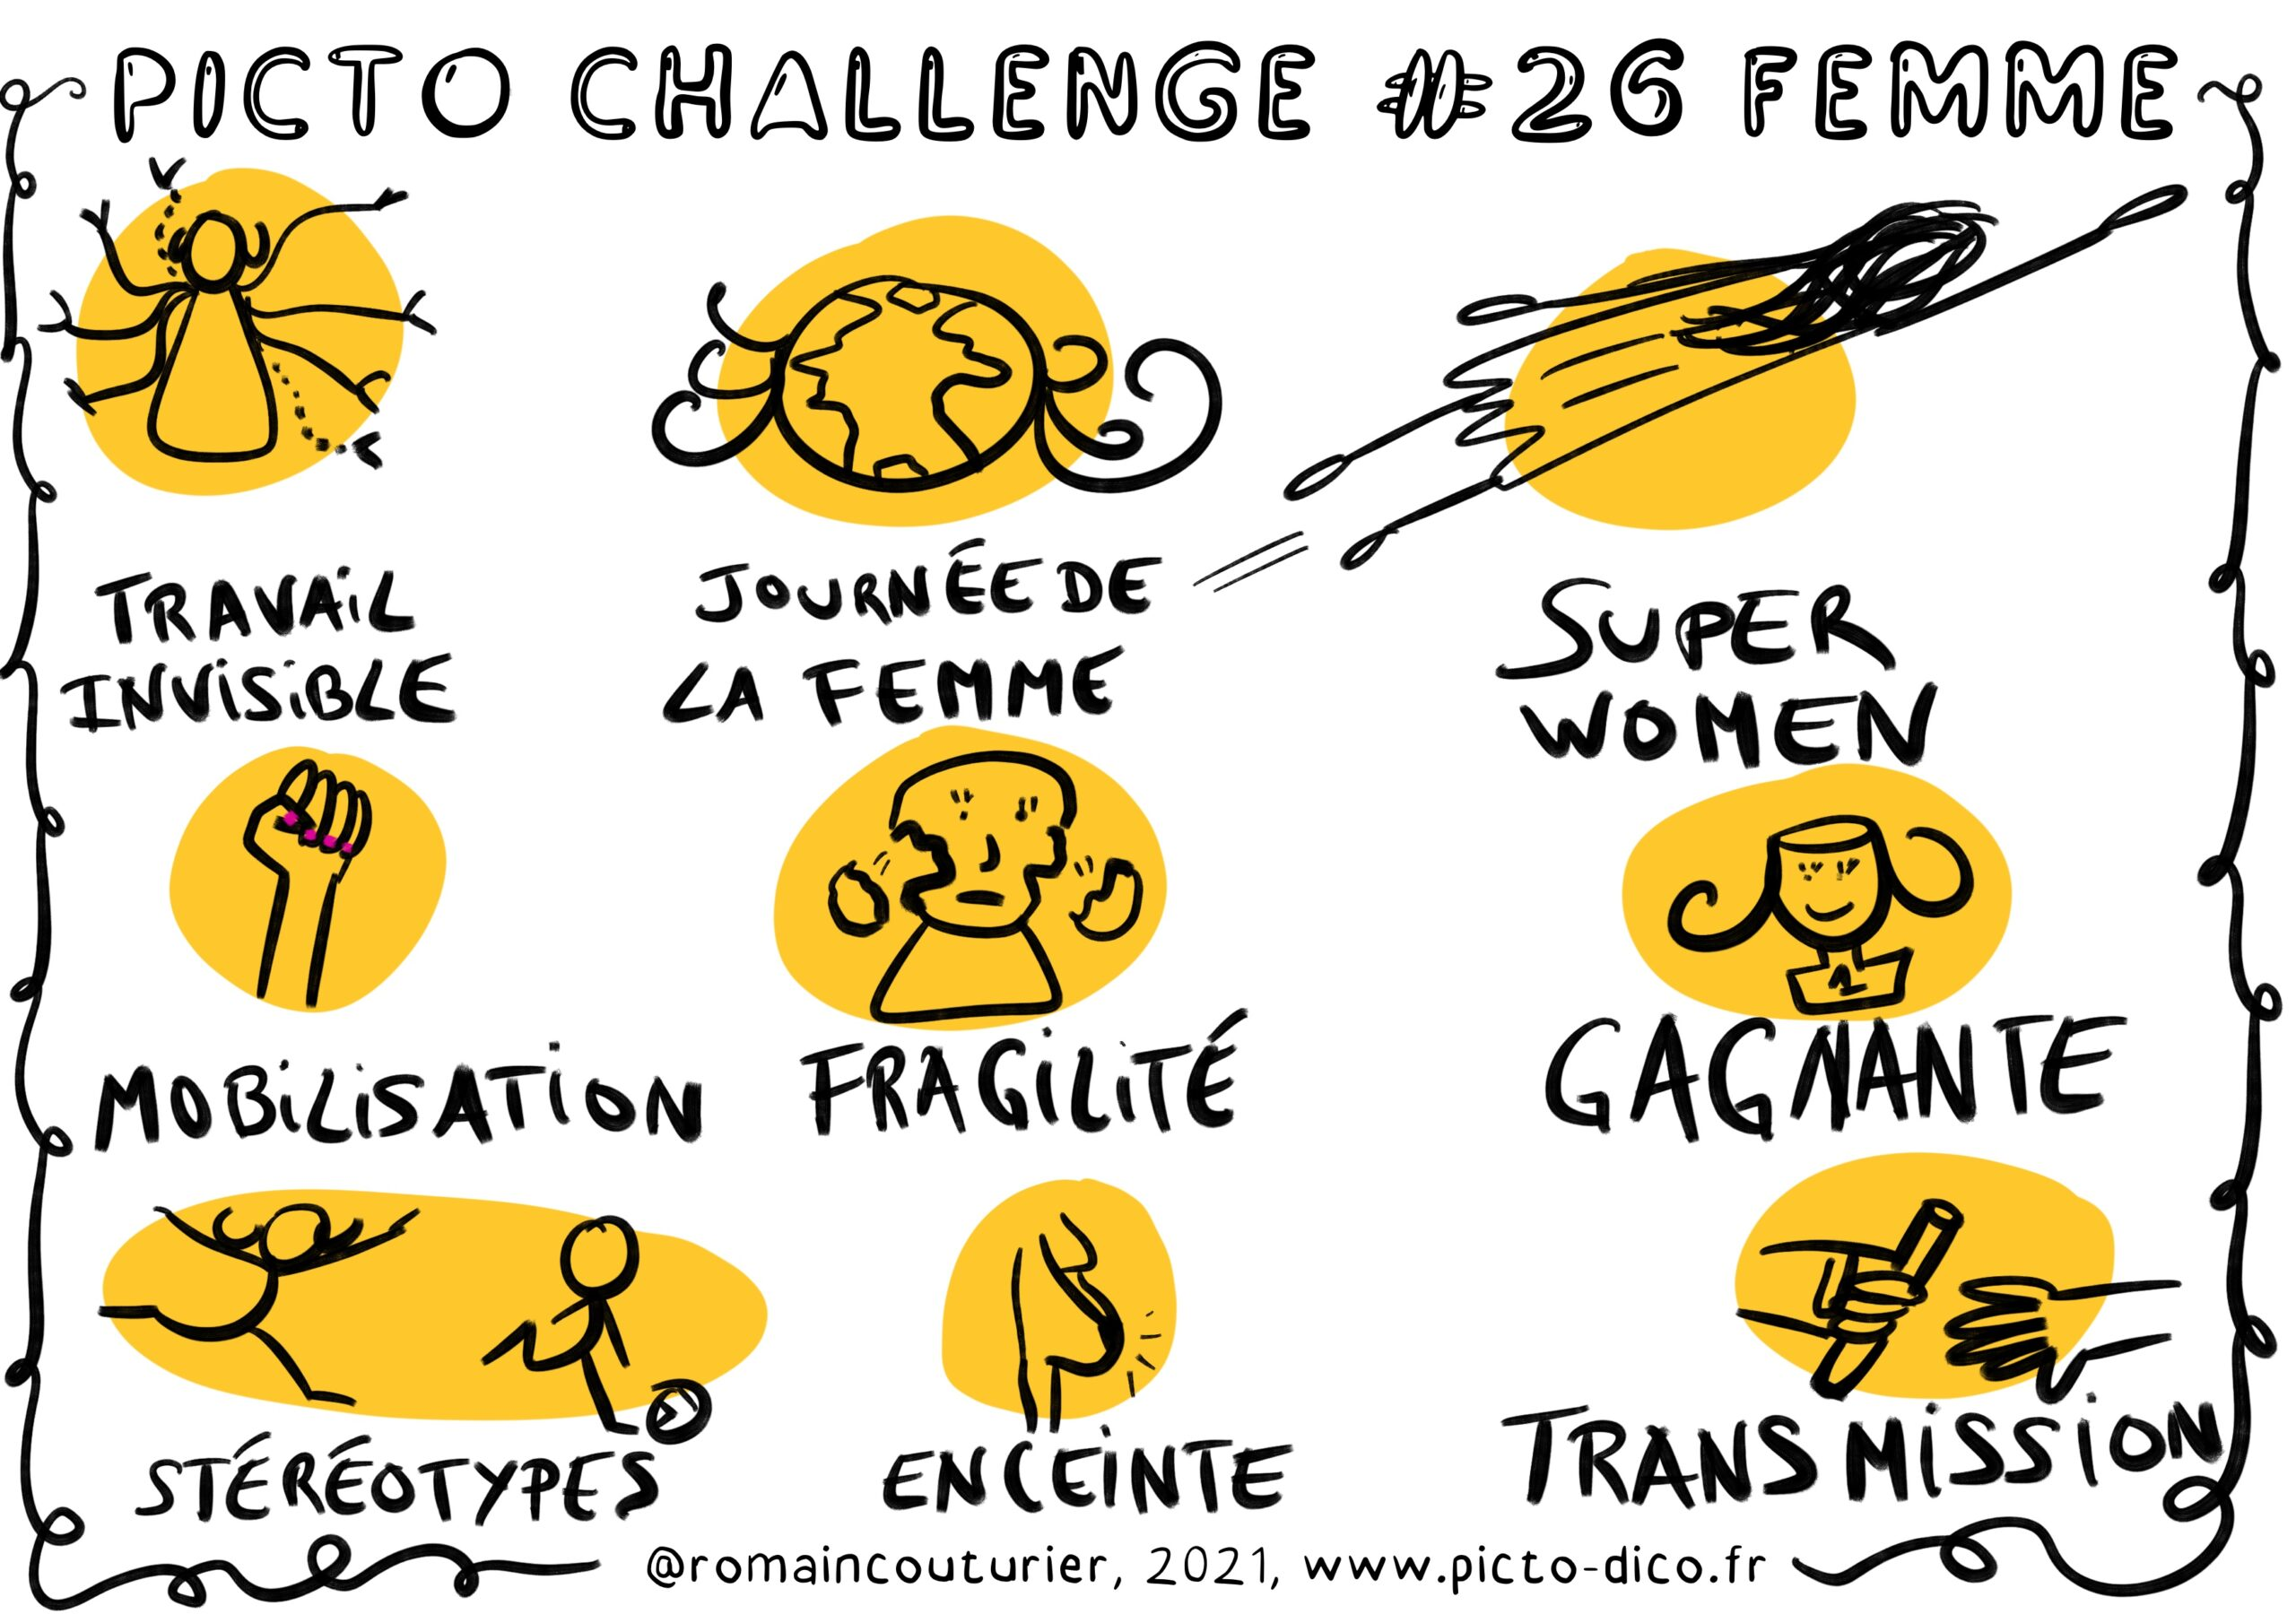 PictoChallenge n°26 spécial Femme